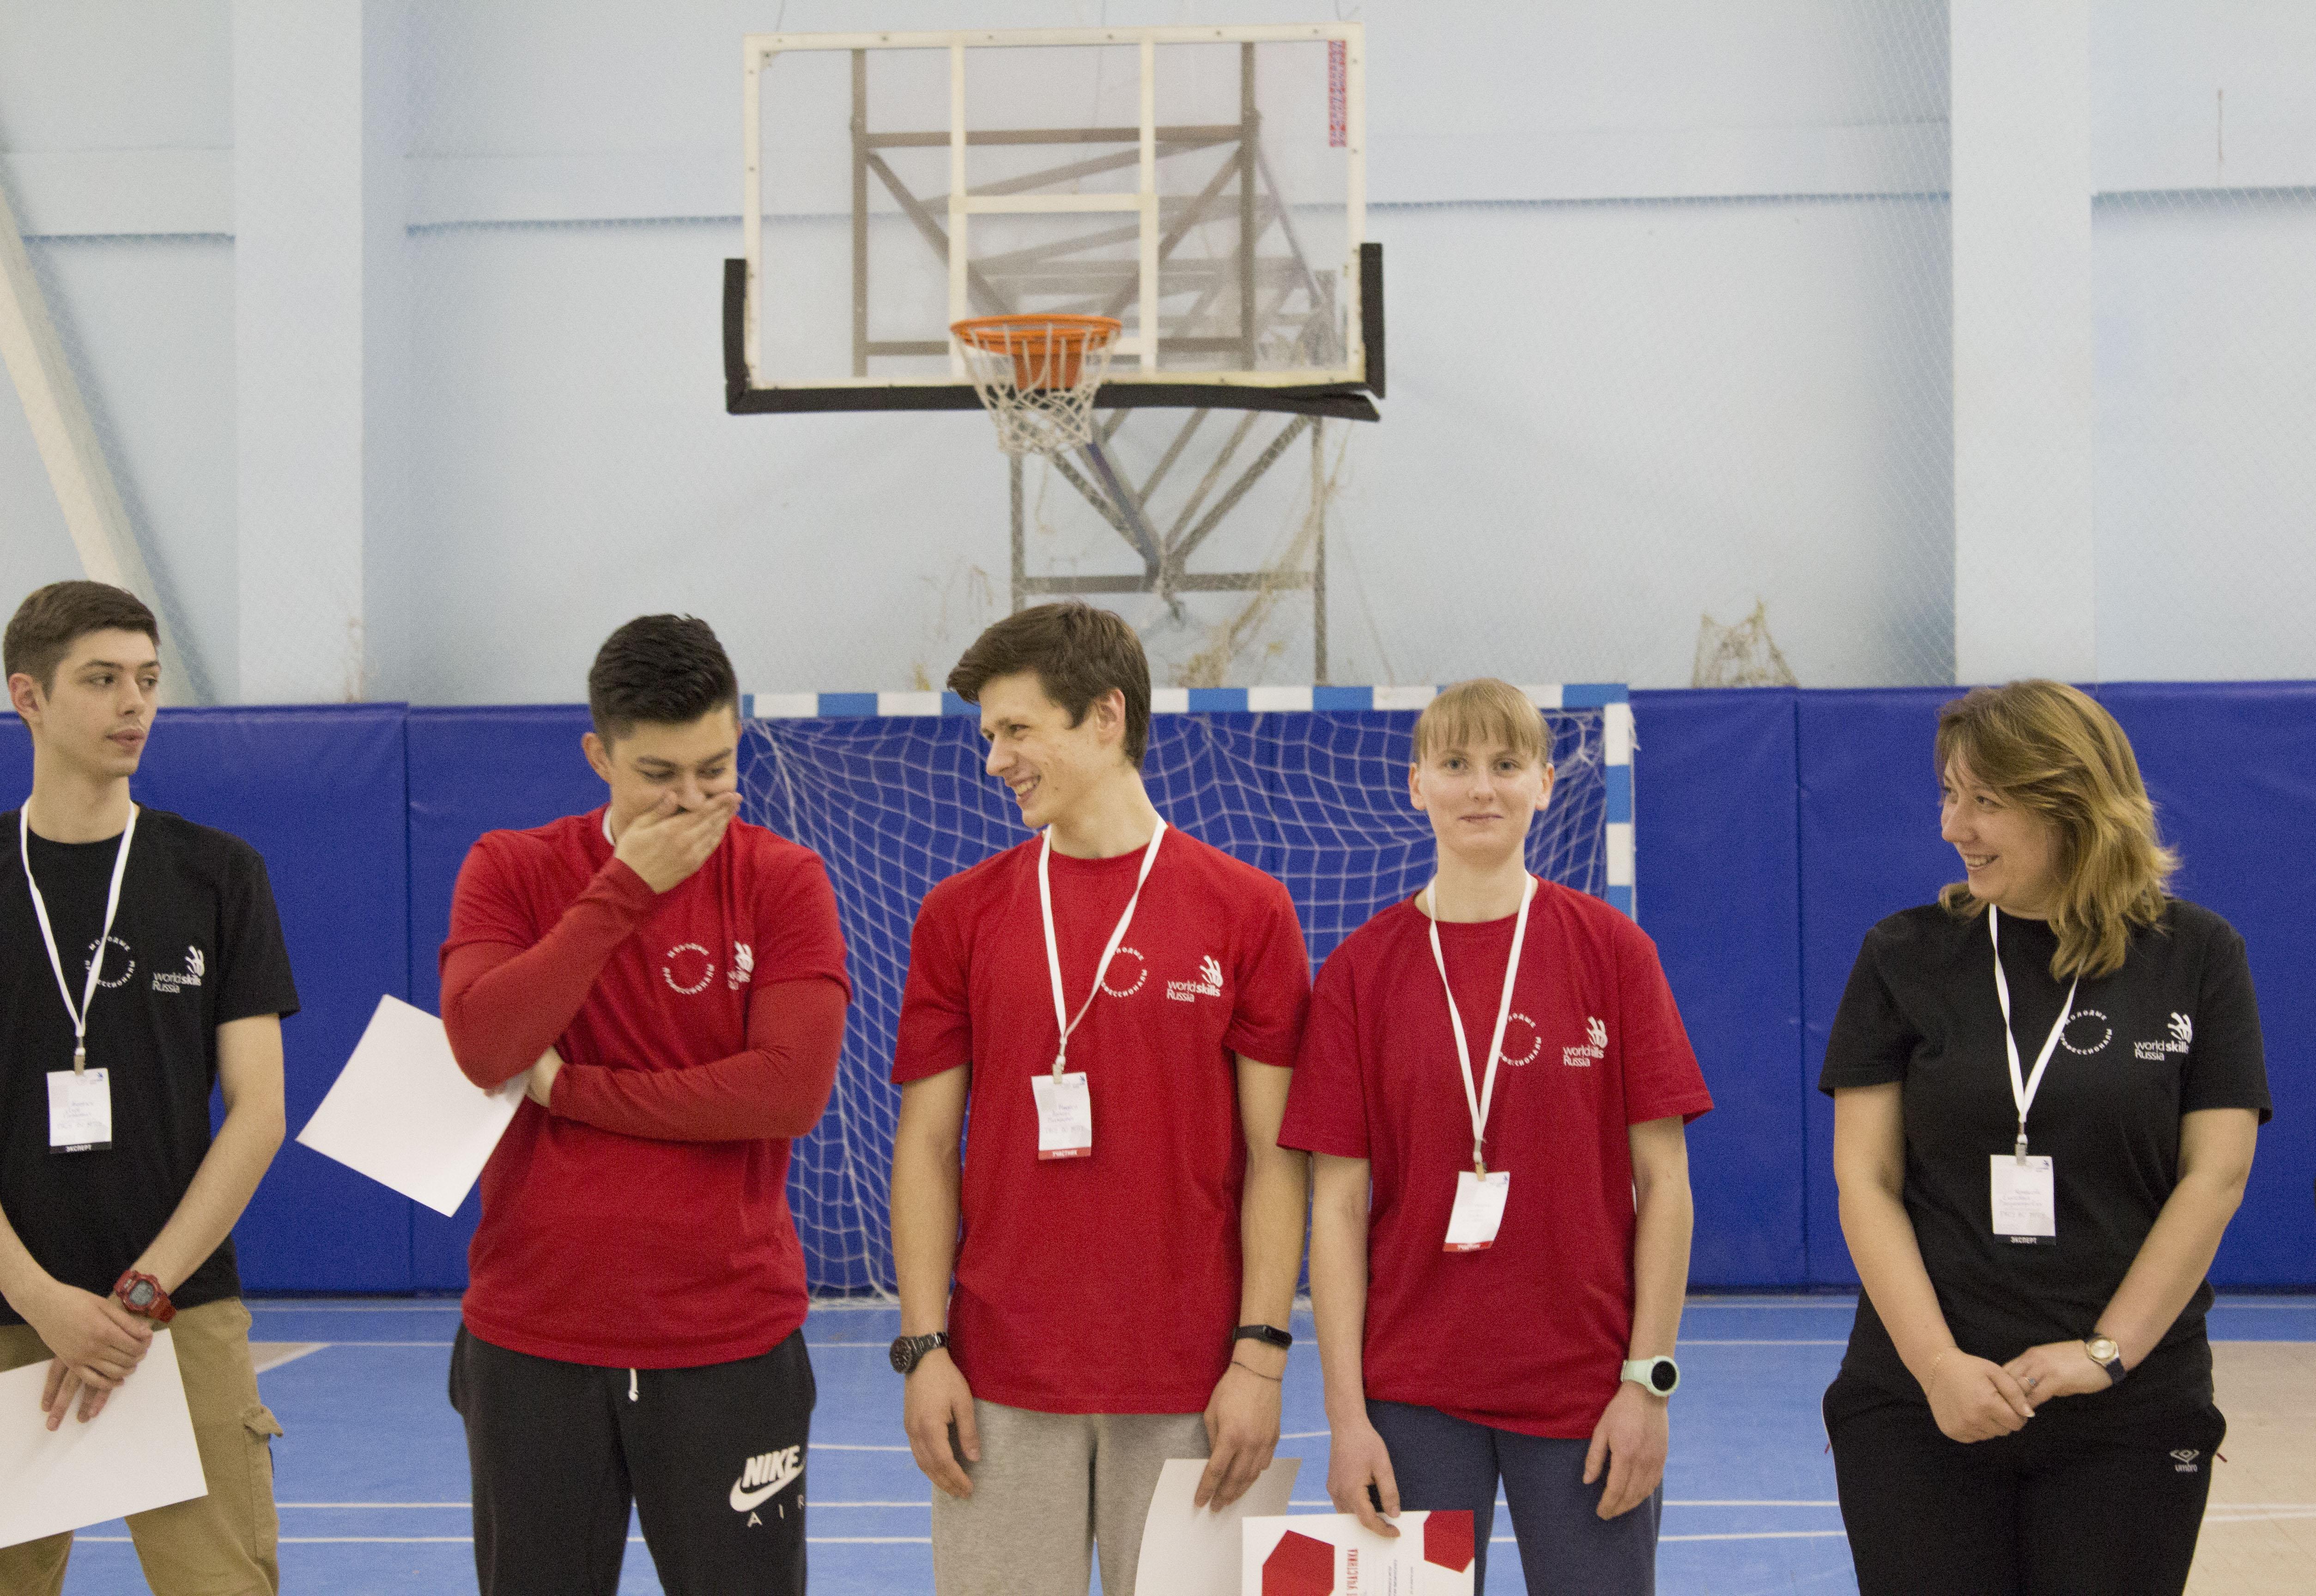 Чемпионат WorldSkills вИЕСТ: галерея церемонии закрытия